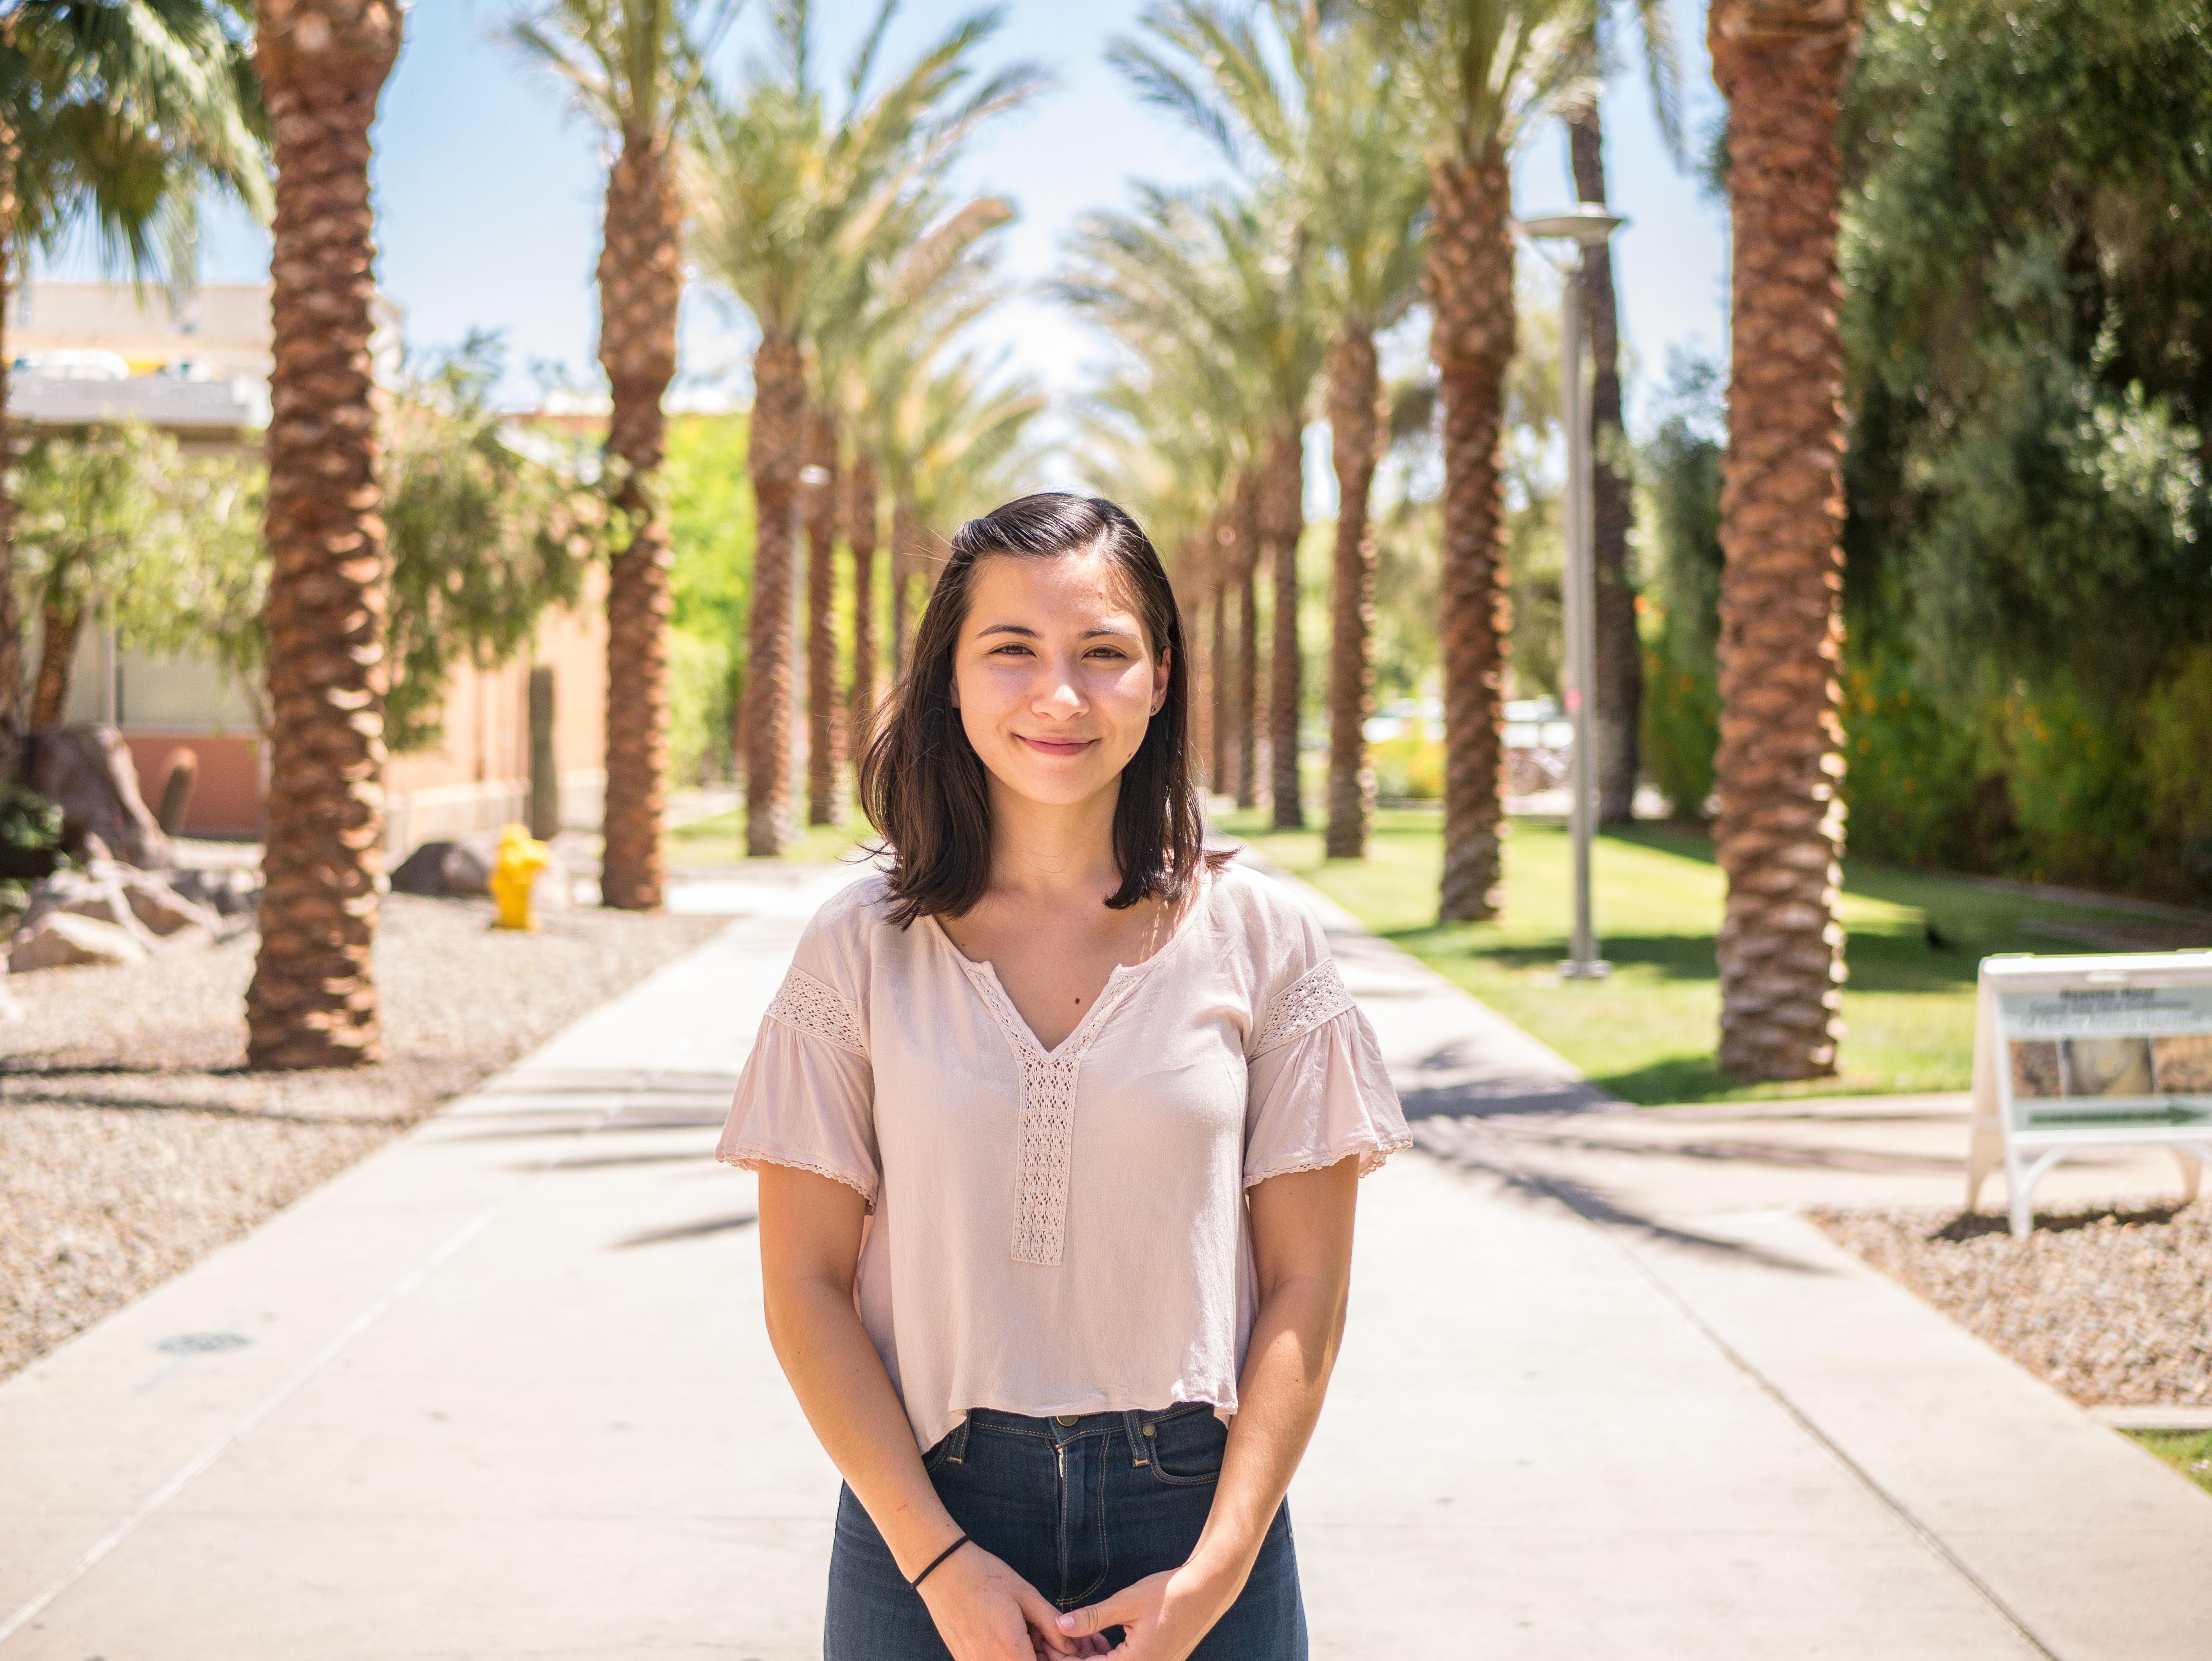 Ashley Thompson, ASU Department of Psychology